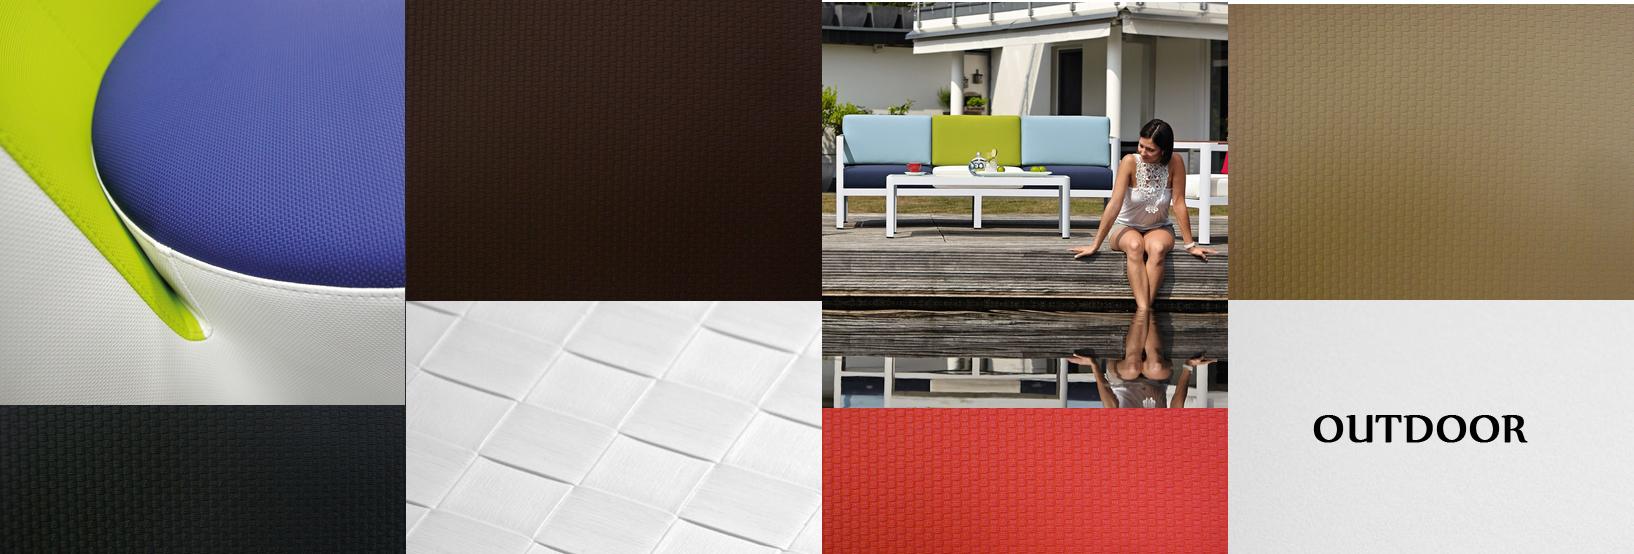 Materiale textile de exterior, imbinarea armonioasa intre util si confort